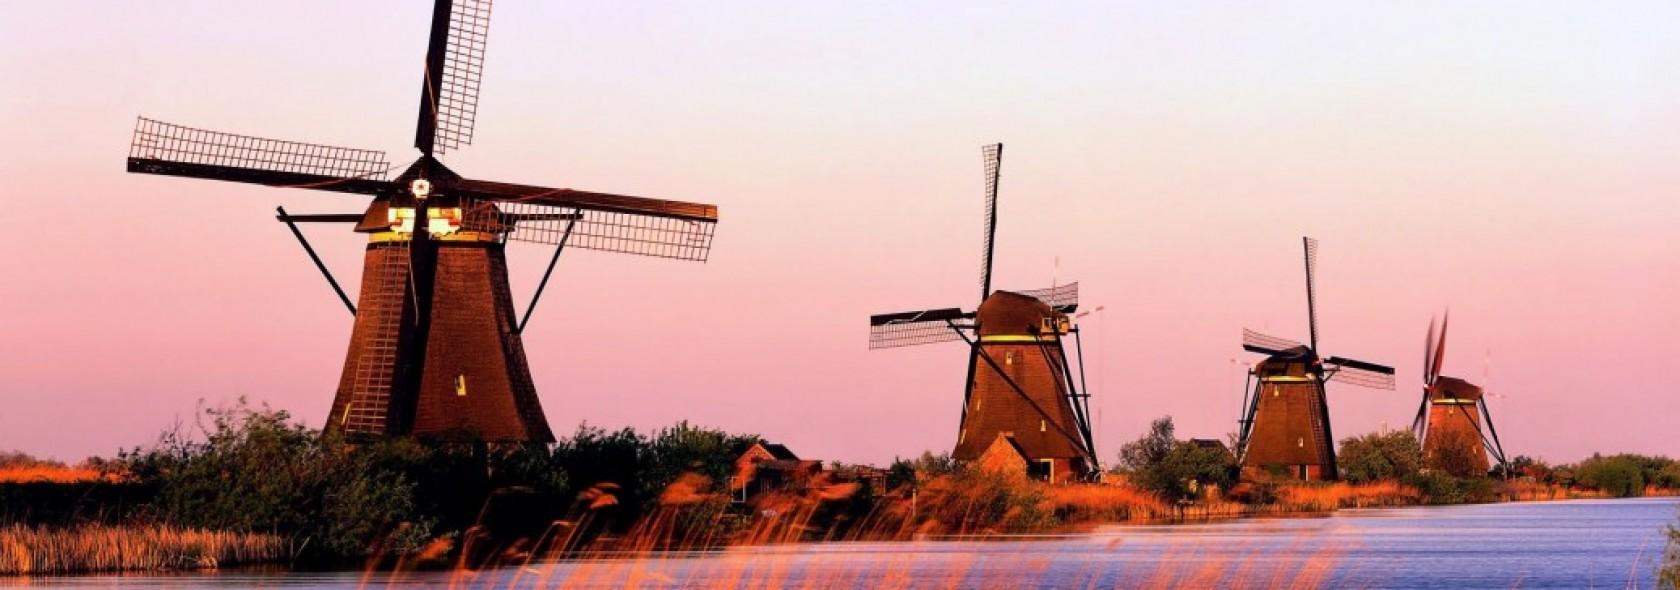 Agenzia viaggi e turismo agenzie viaggi sardegna for Amsterdam offerte viaggi